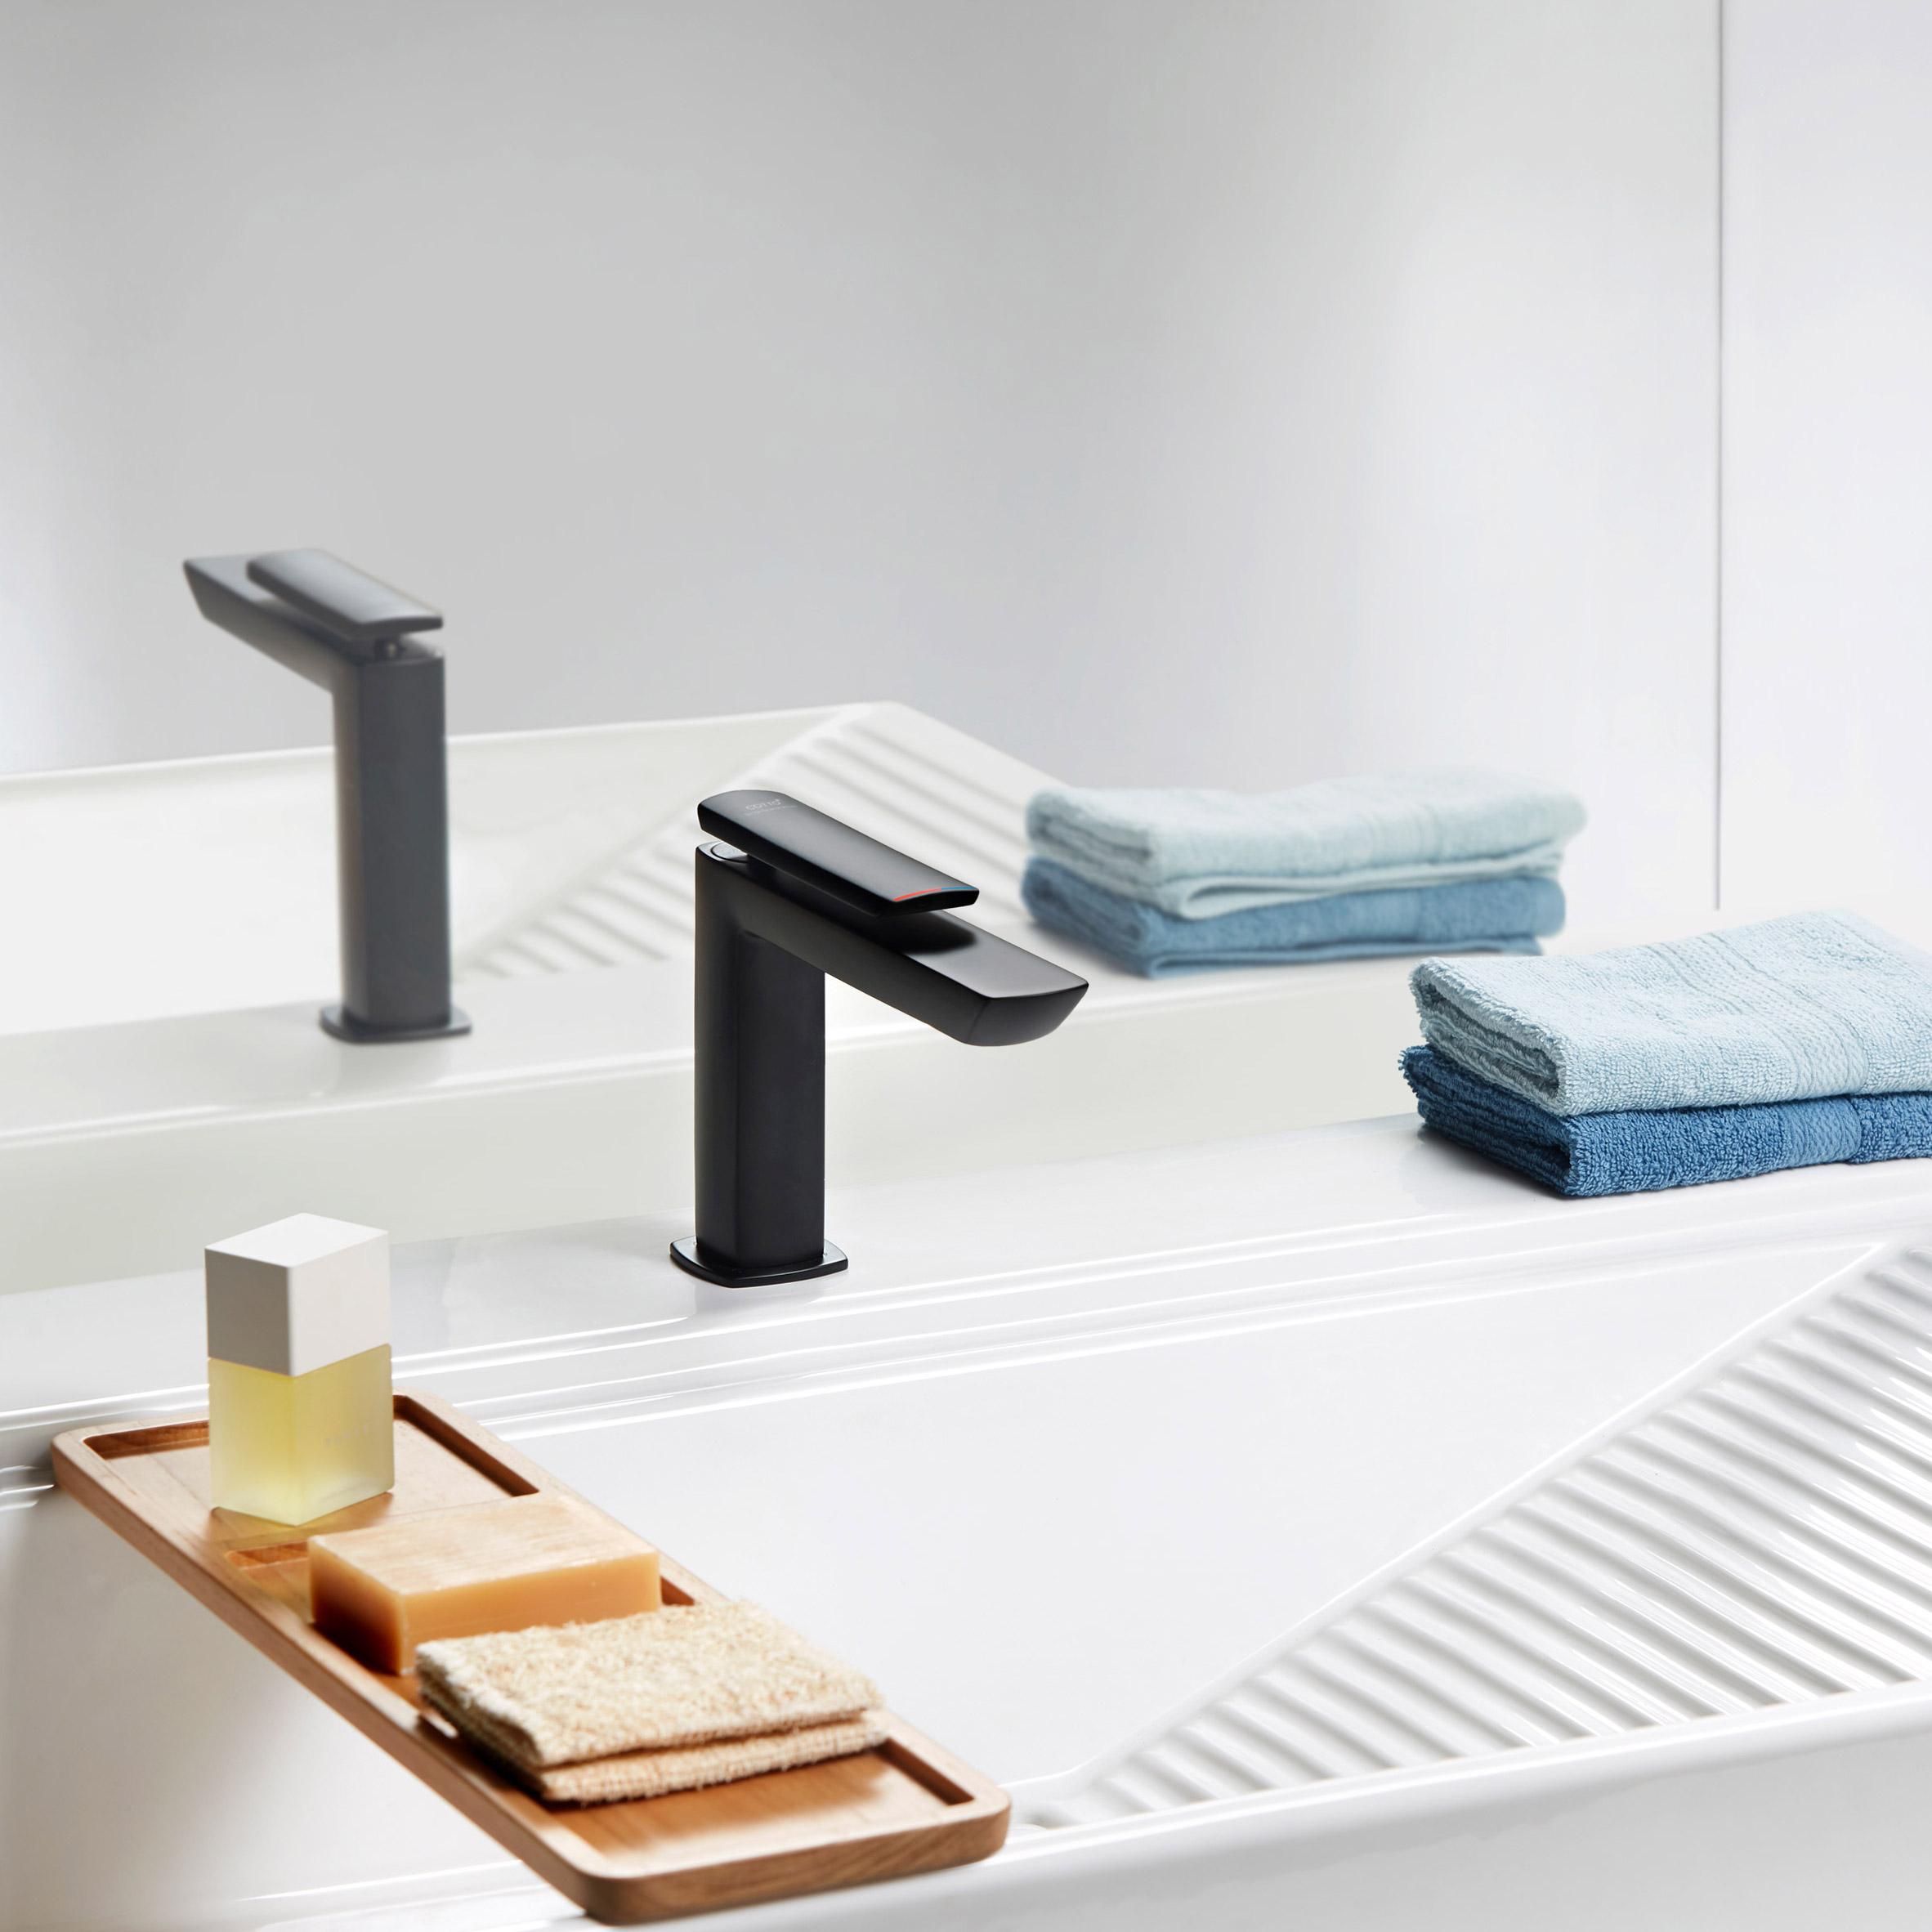 Jacob Jensen creates minimalist bathroom collection for Cotto